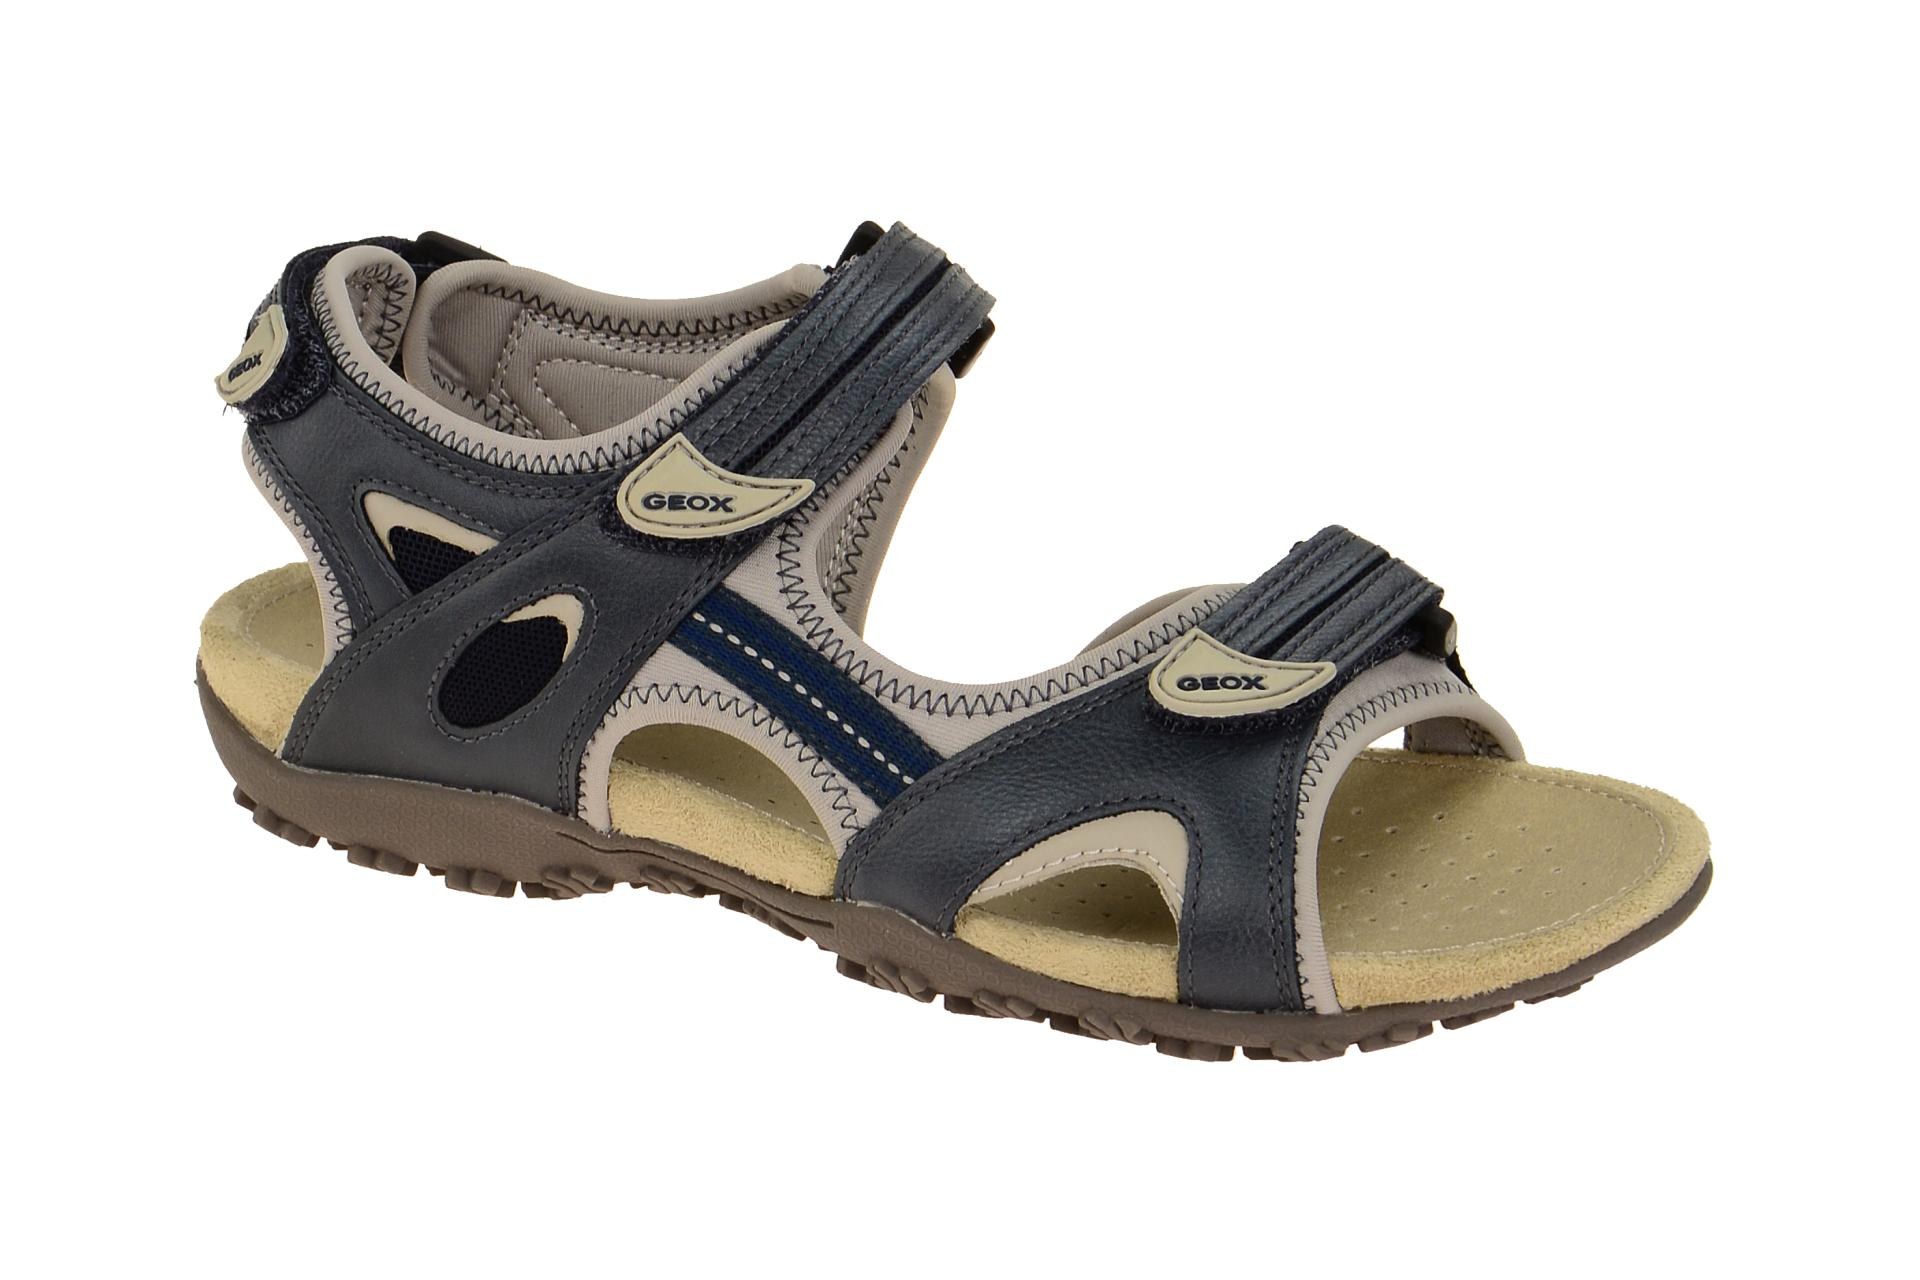 geox schuhe sand strel blau damen sandale sandaletten d1125c 05415 c4254 neu ebay. Black Bedroom Furniture Sets. Home Design Ideas